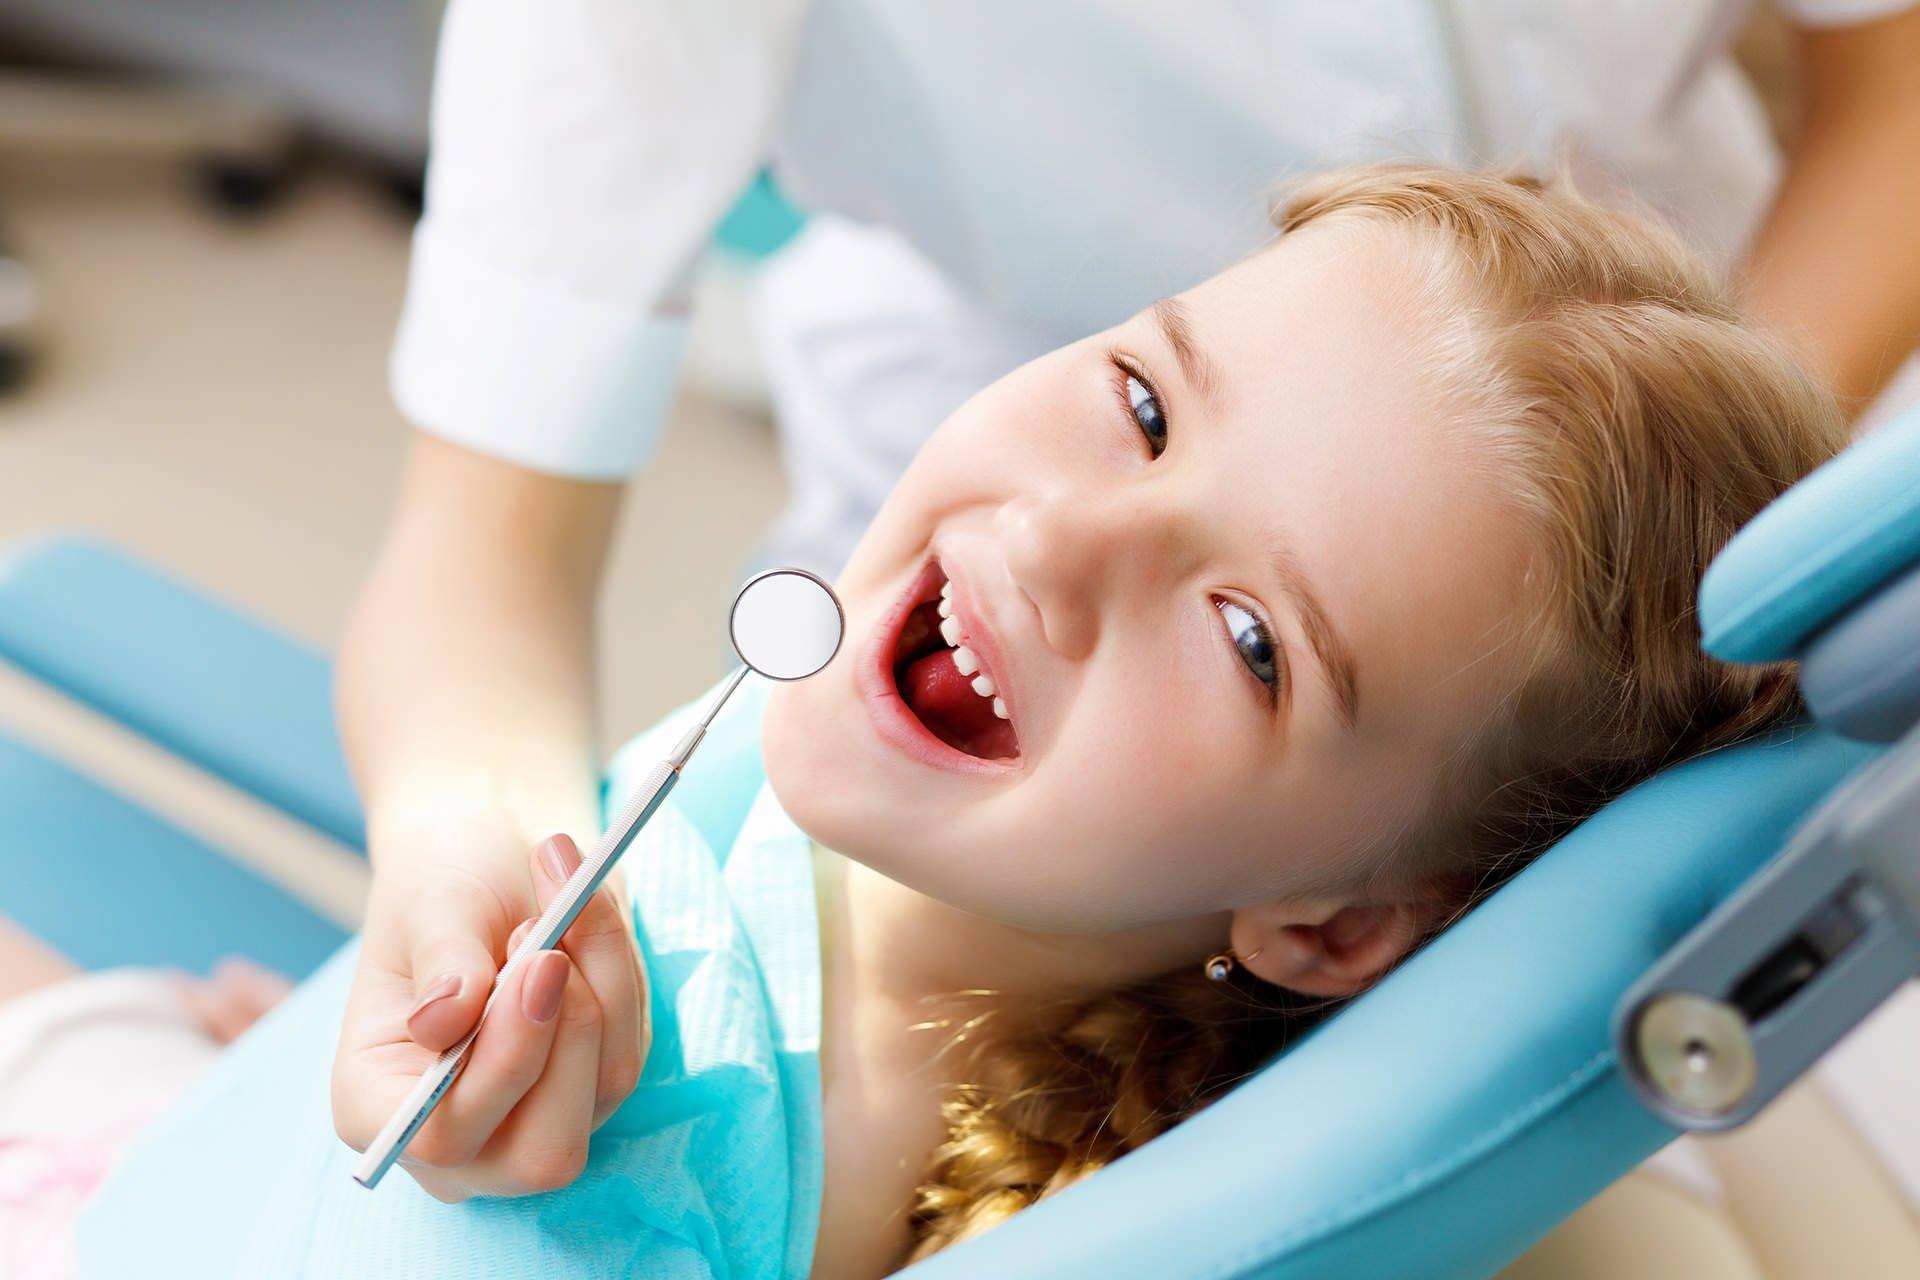 Prima vizita la dentist – de ce este important sa mergi cu cel mic la stomatolog incepand cu varsta de 1 an?